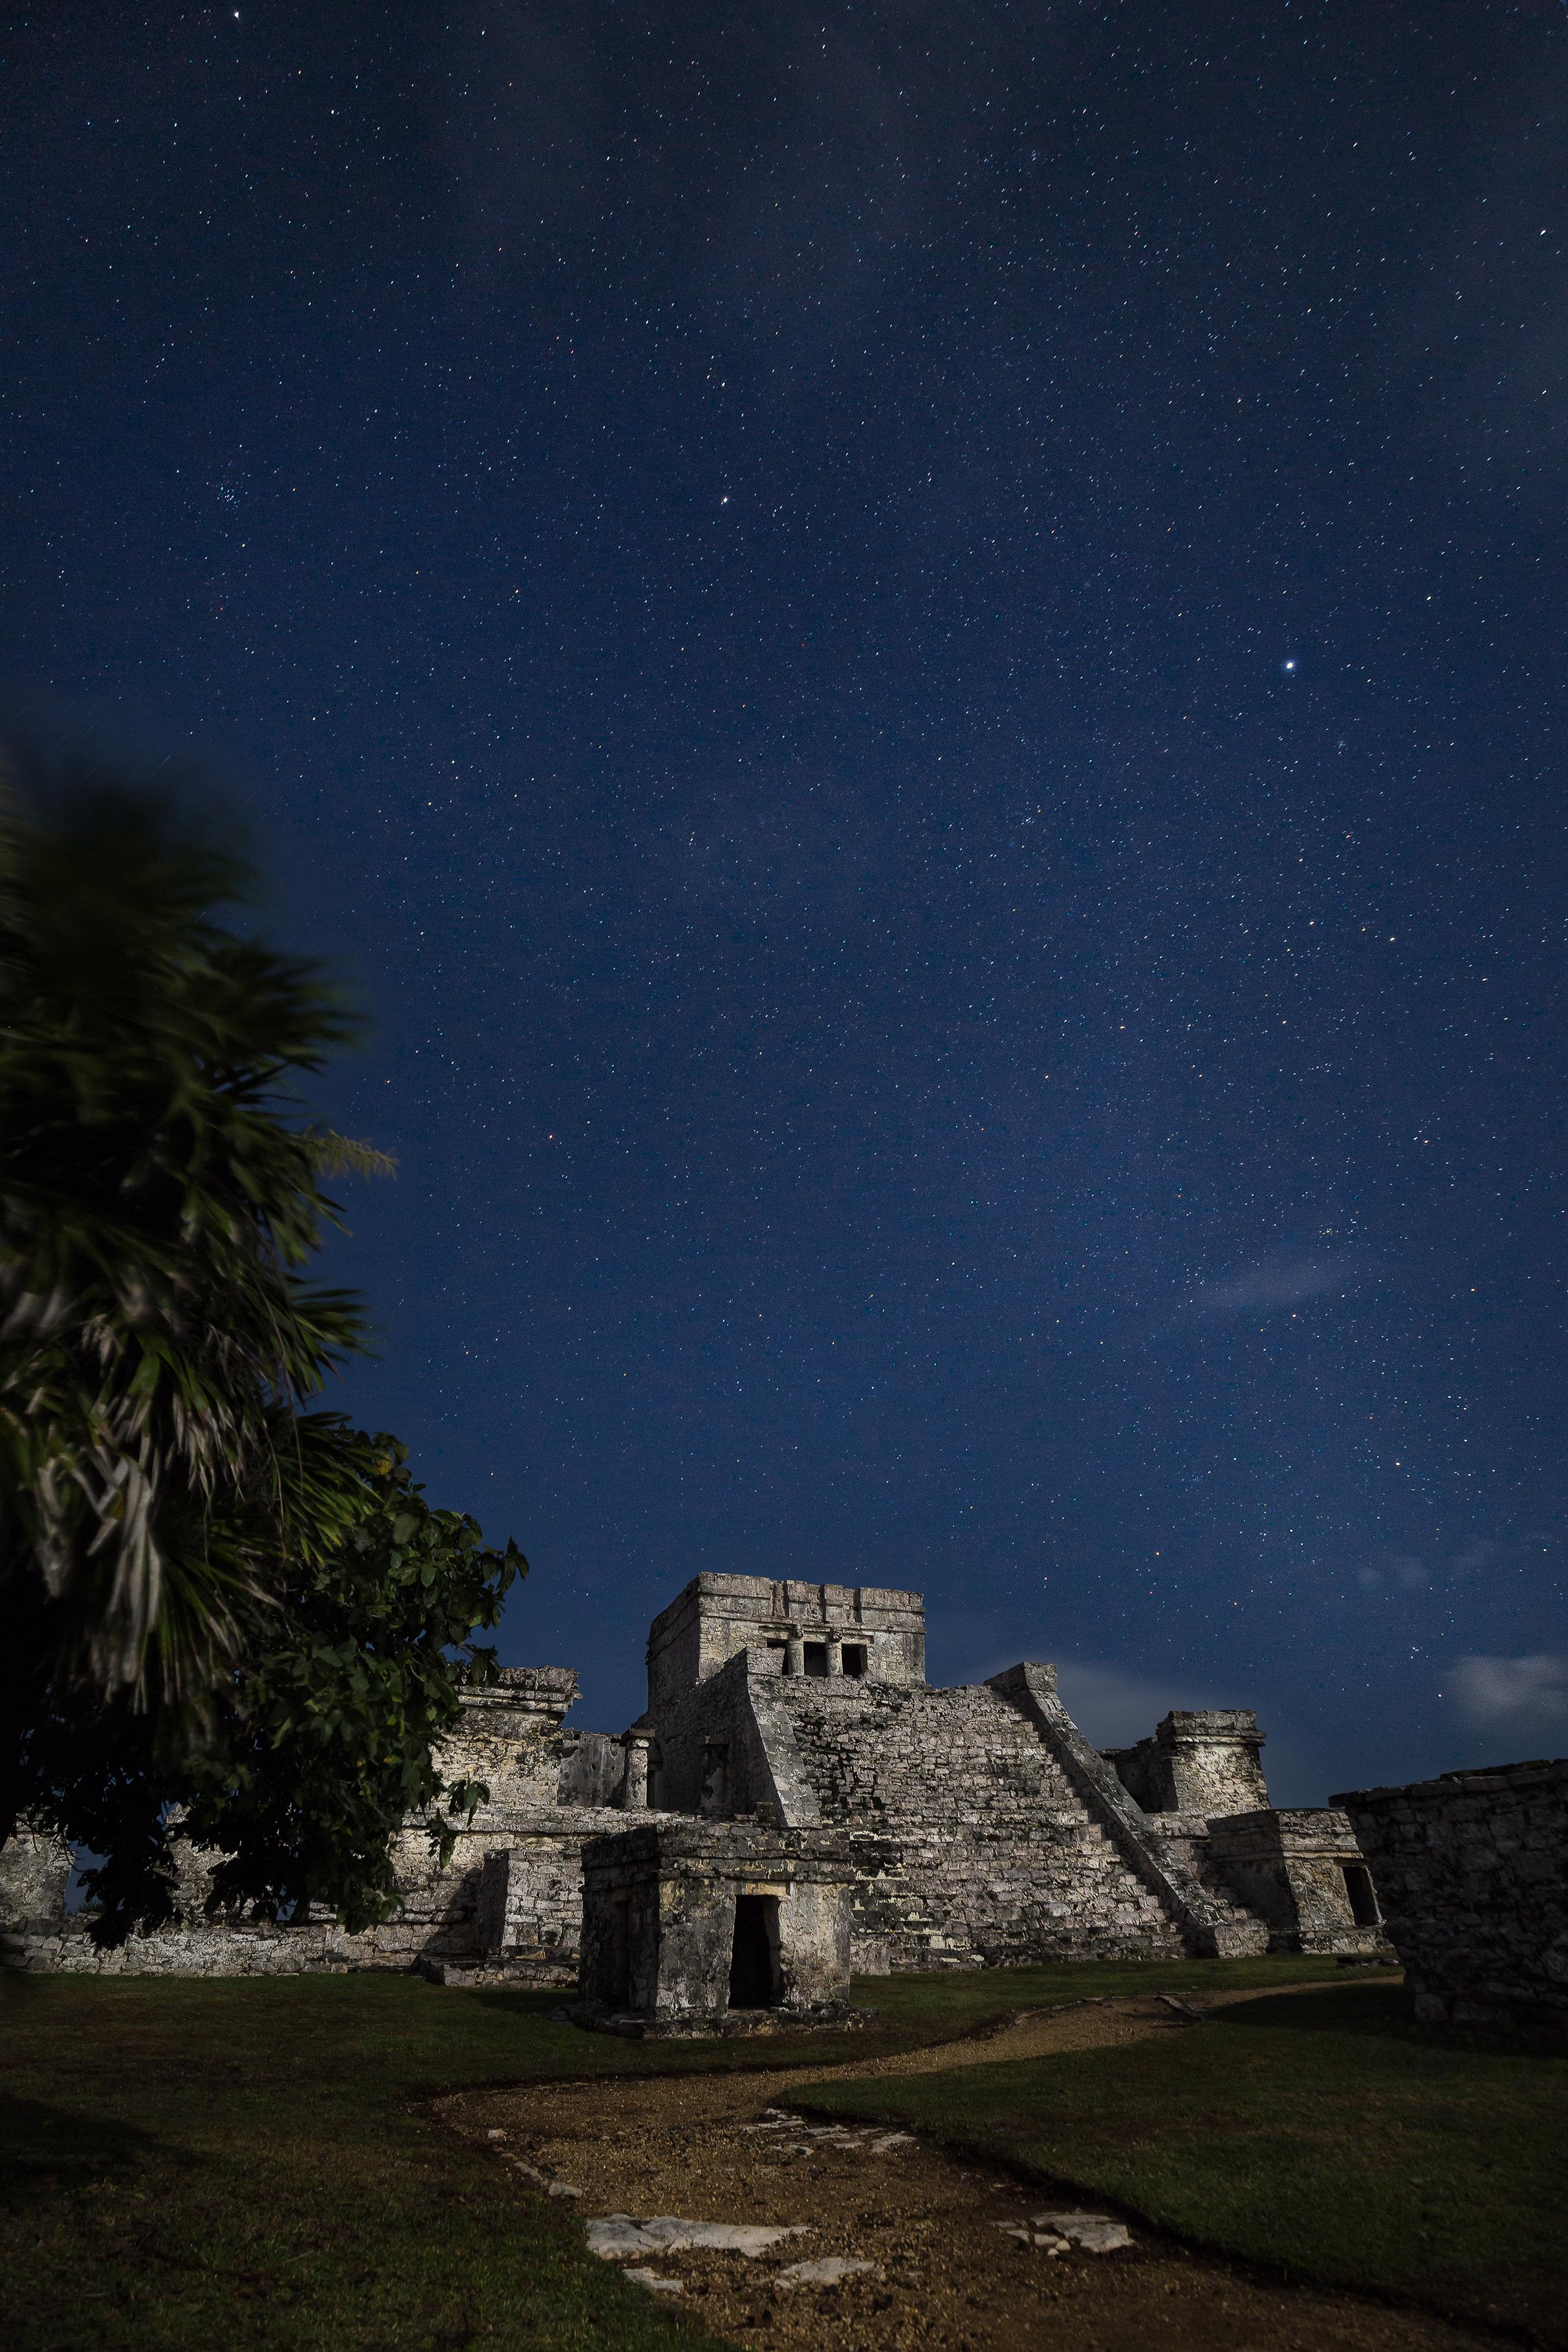 tulum-ruins-stars-3-mexico-sina-falker